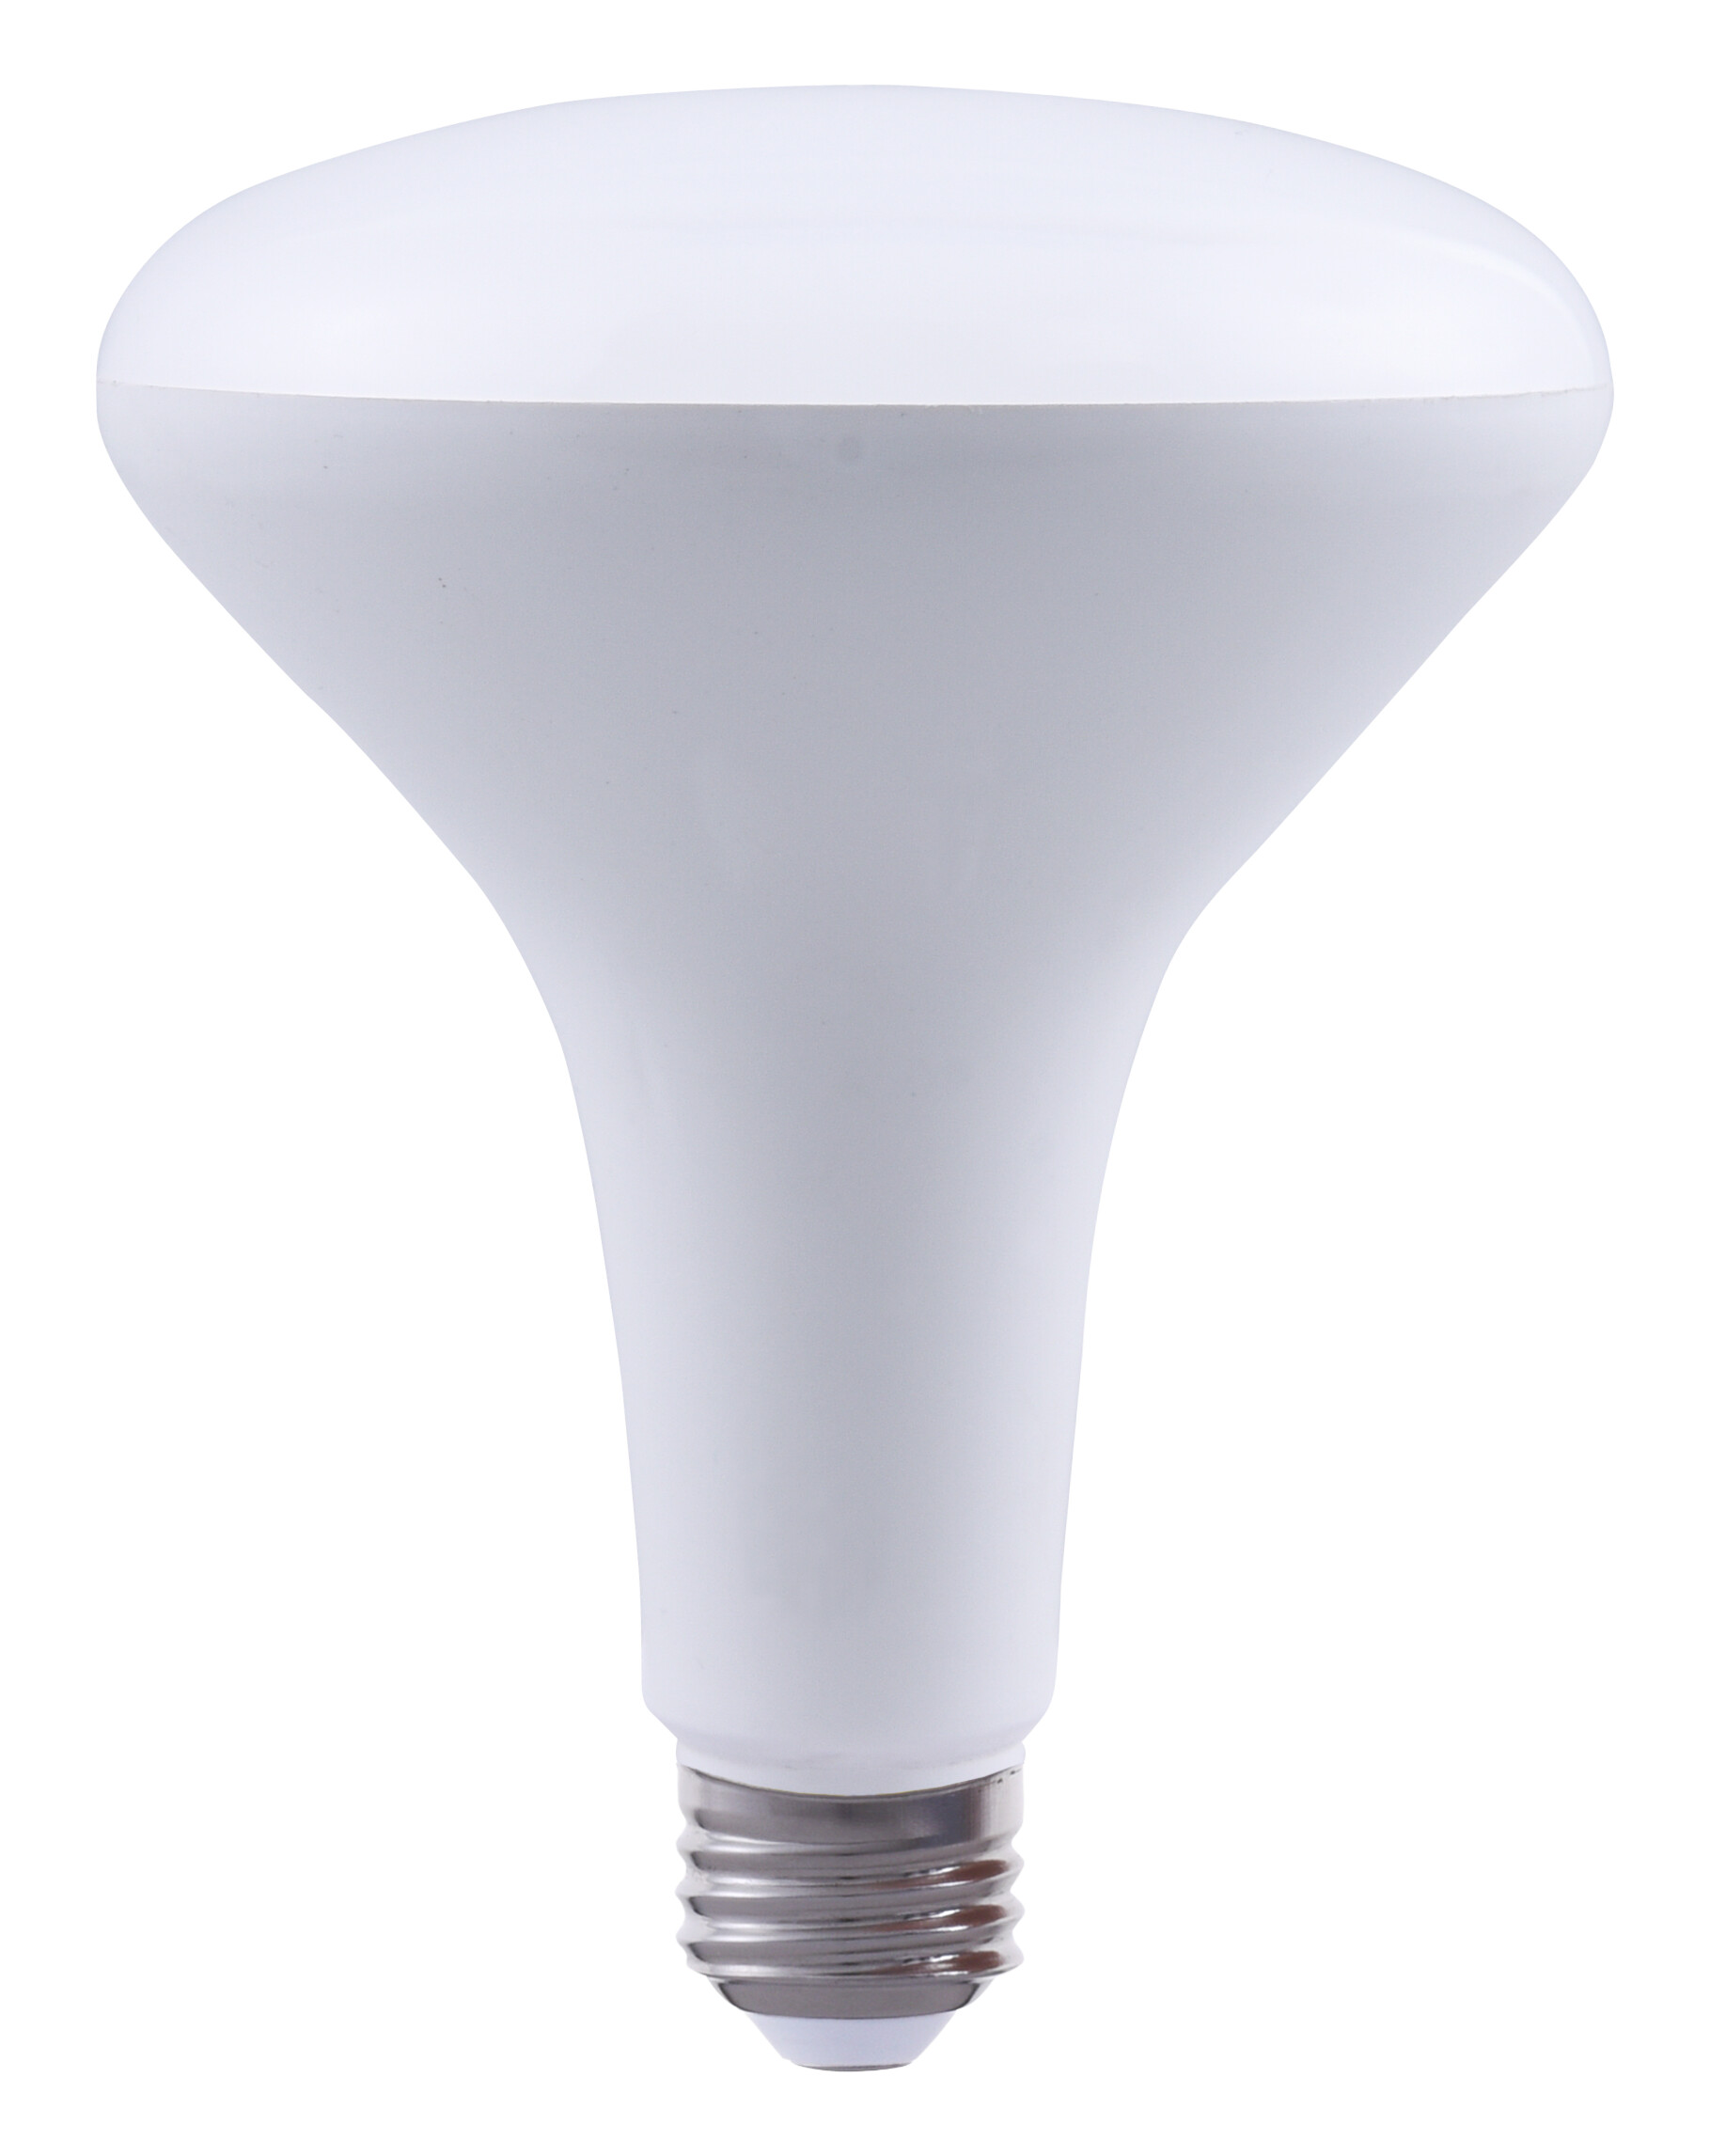 EIKO® LED17WBR40/827-DIM-G9